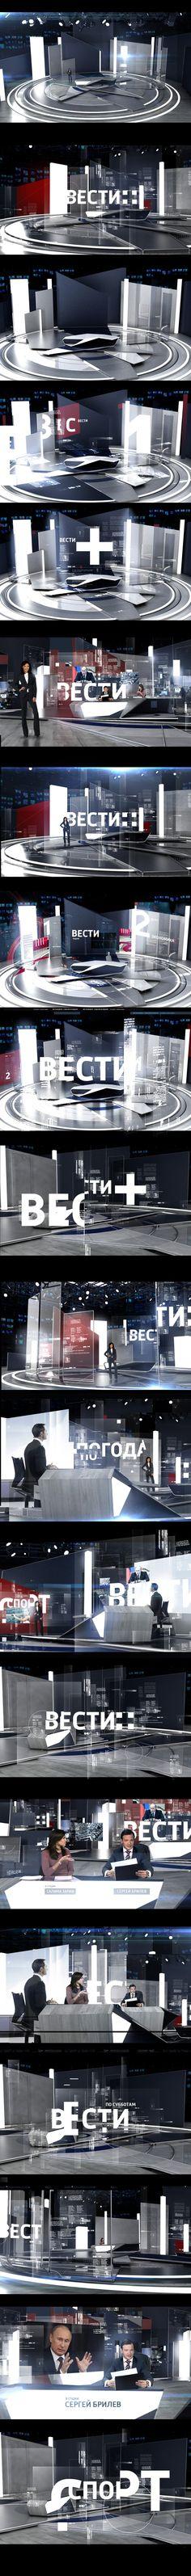 RUSSIA_1 channel NEWS STUDIO on Behance